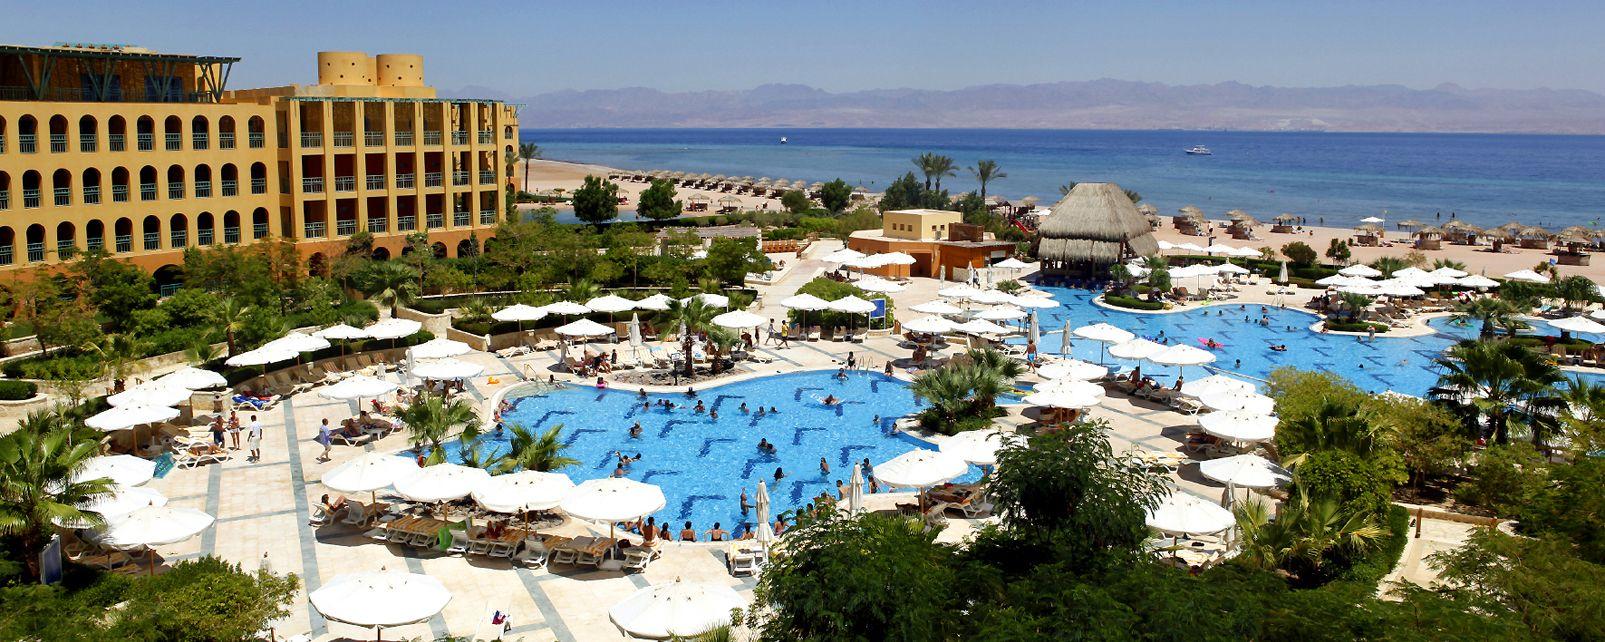 Hôtel InterContinental Beach Resort Taba Heights